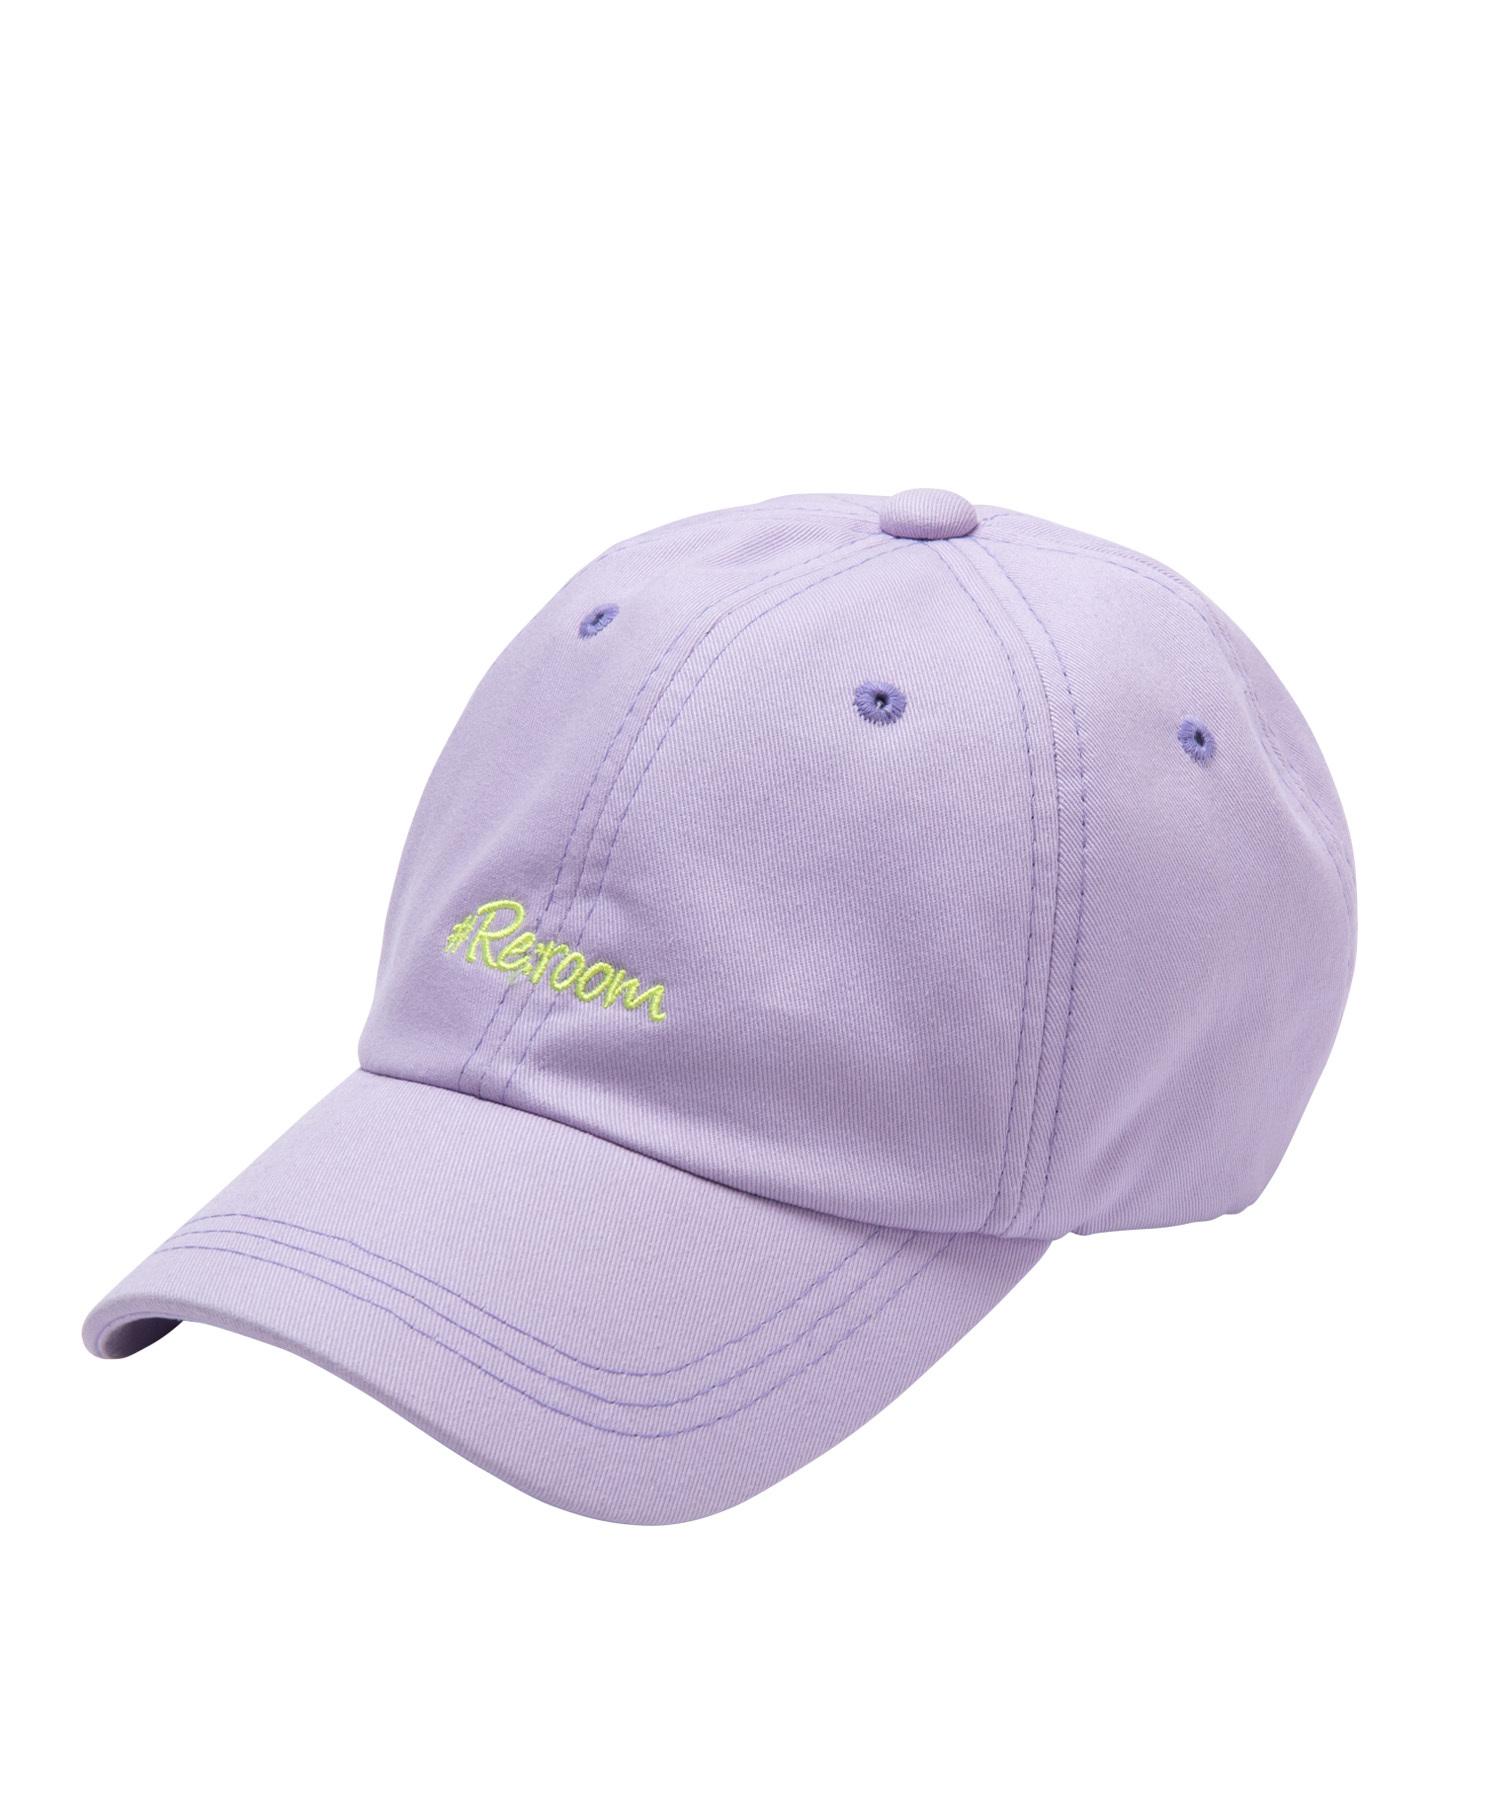 LOGO TWILL LONG ADJUSTER CAP[REH053]